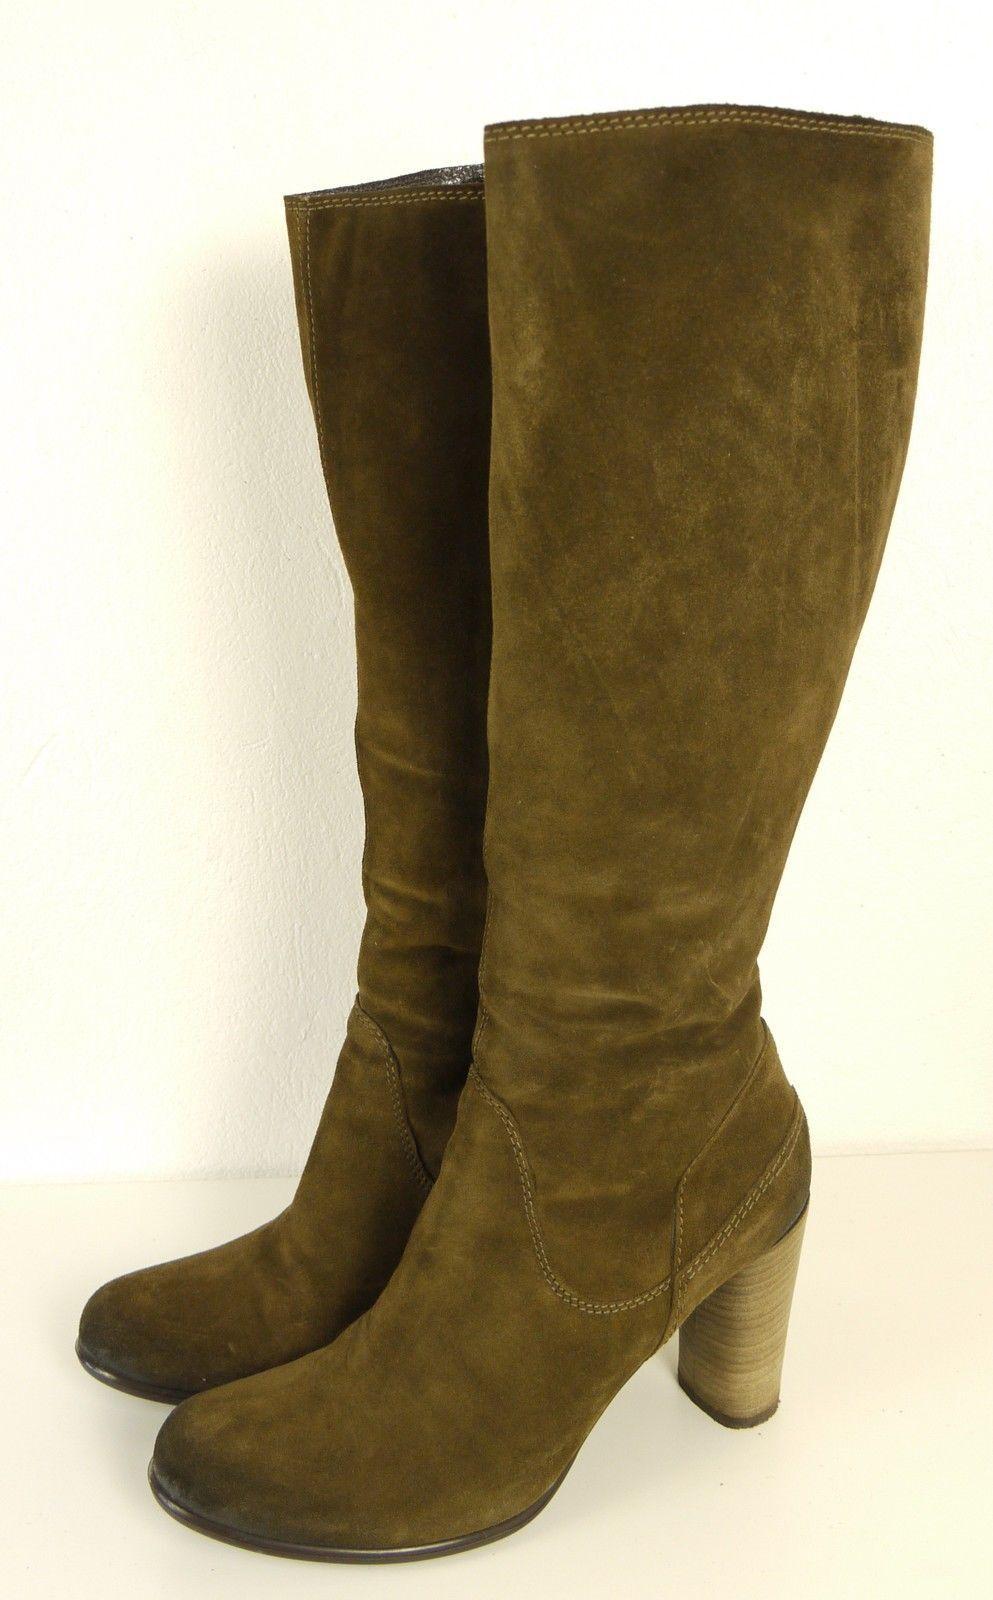 Zapatos especiales con descuento VIC  Stiefel Stiefelette Wildleder Boots Leder Braun Gr. 39 (T62)